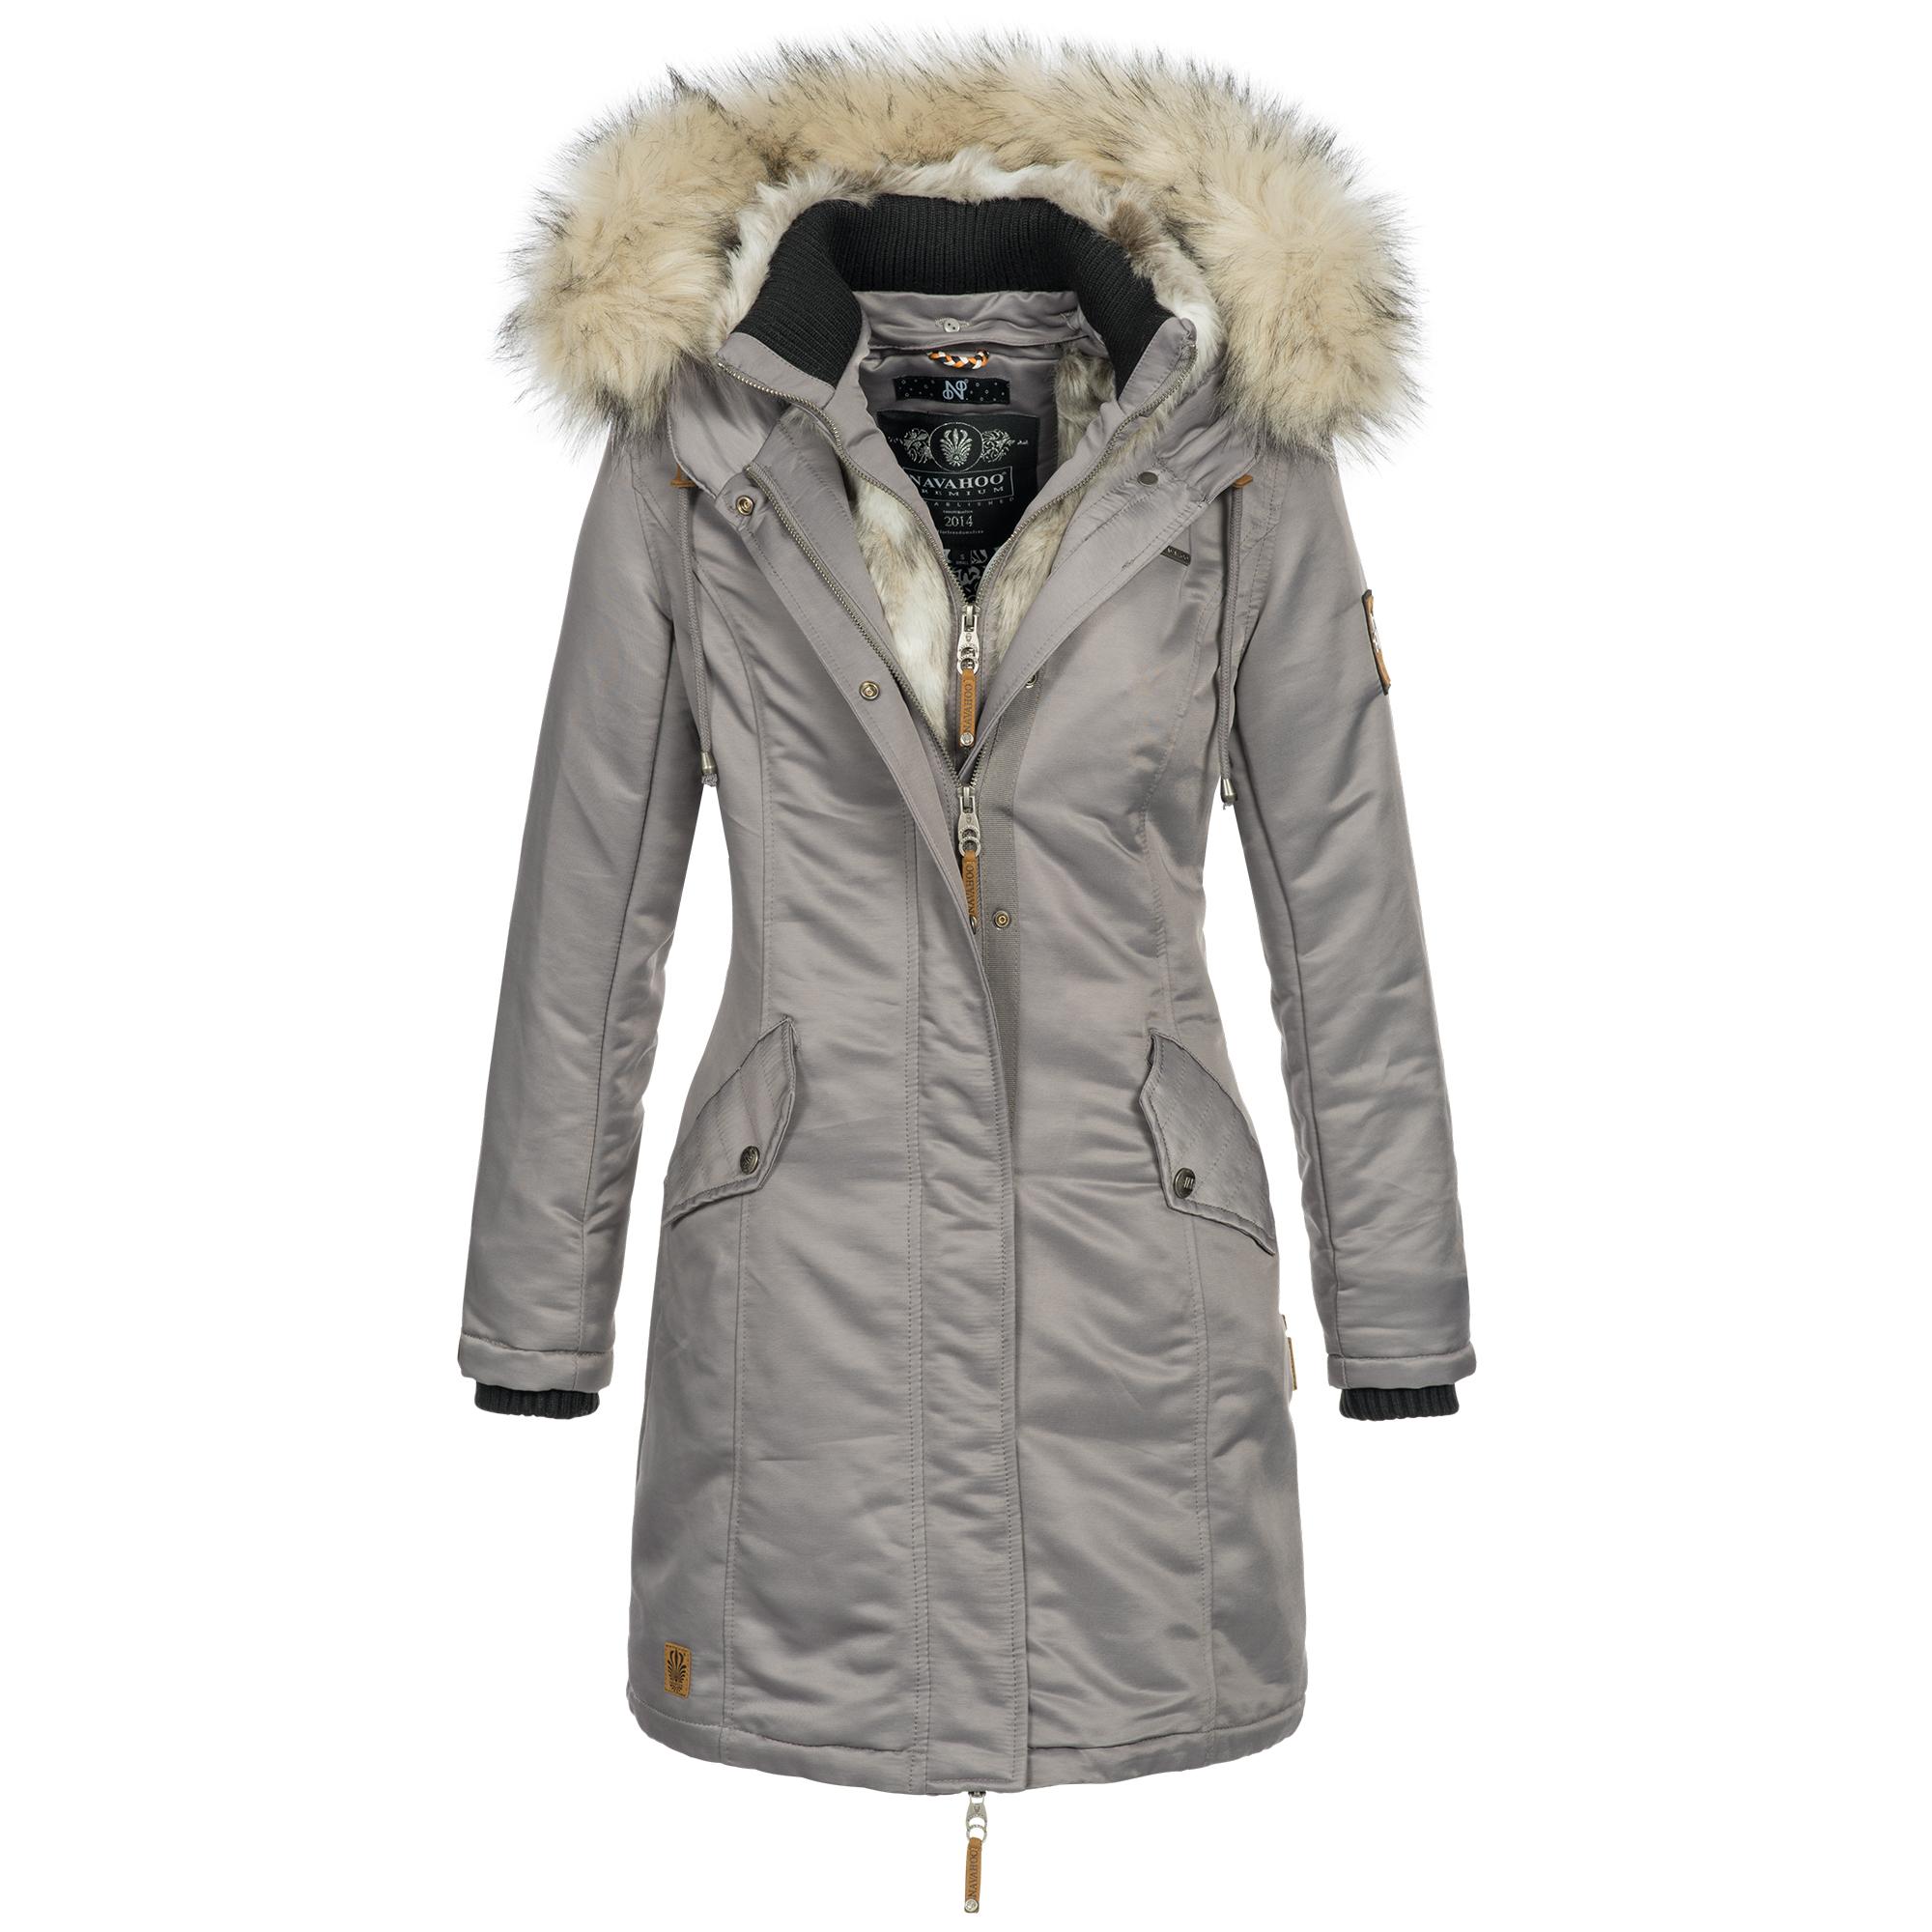 differently 5ec1c 659ef Mantel Luxus Xxl Kapuze Damen Winter Xs Navahoo Winterjacke ...